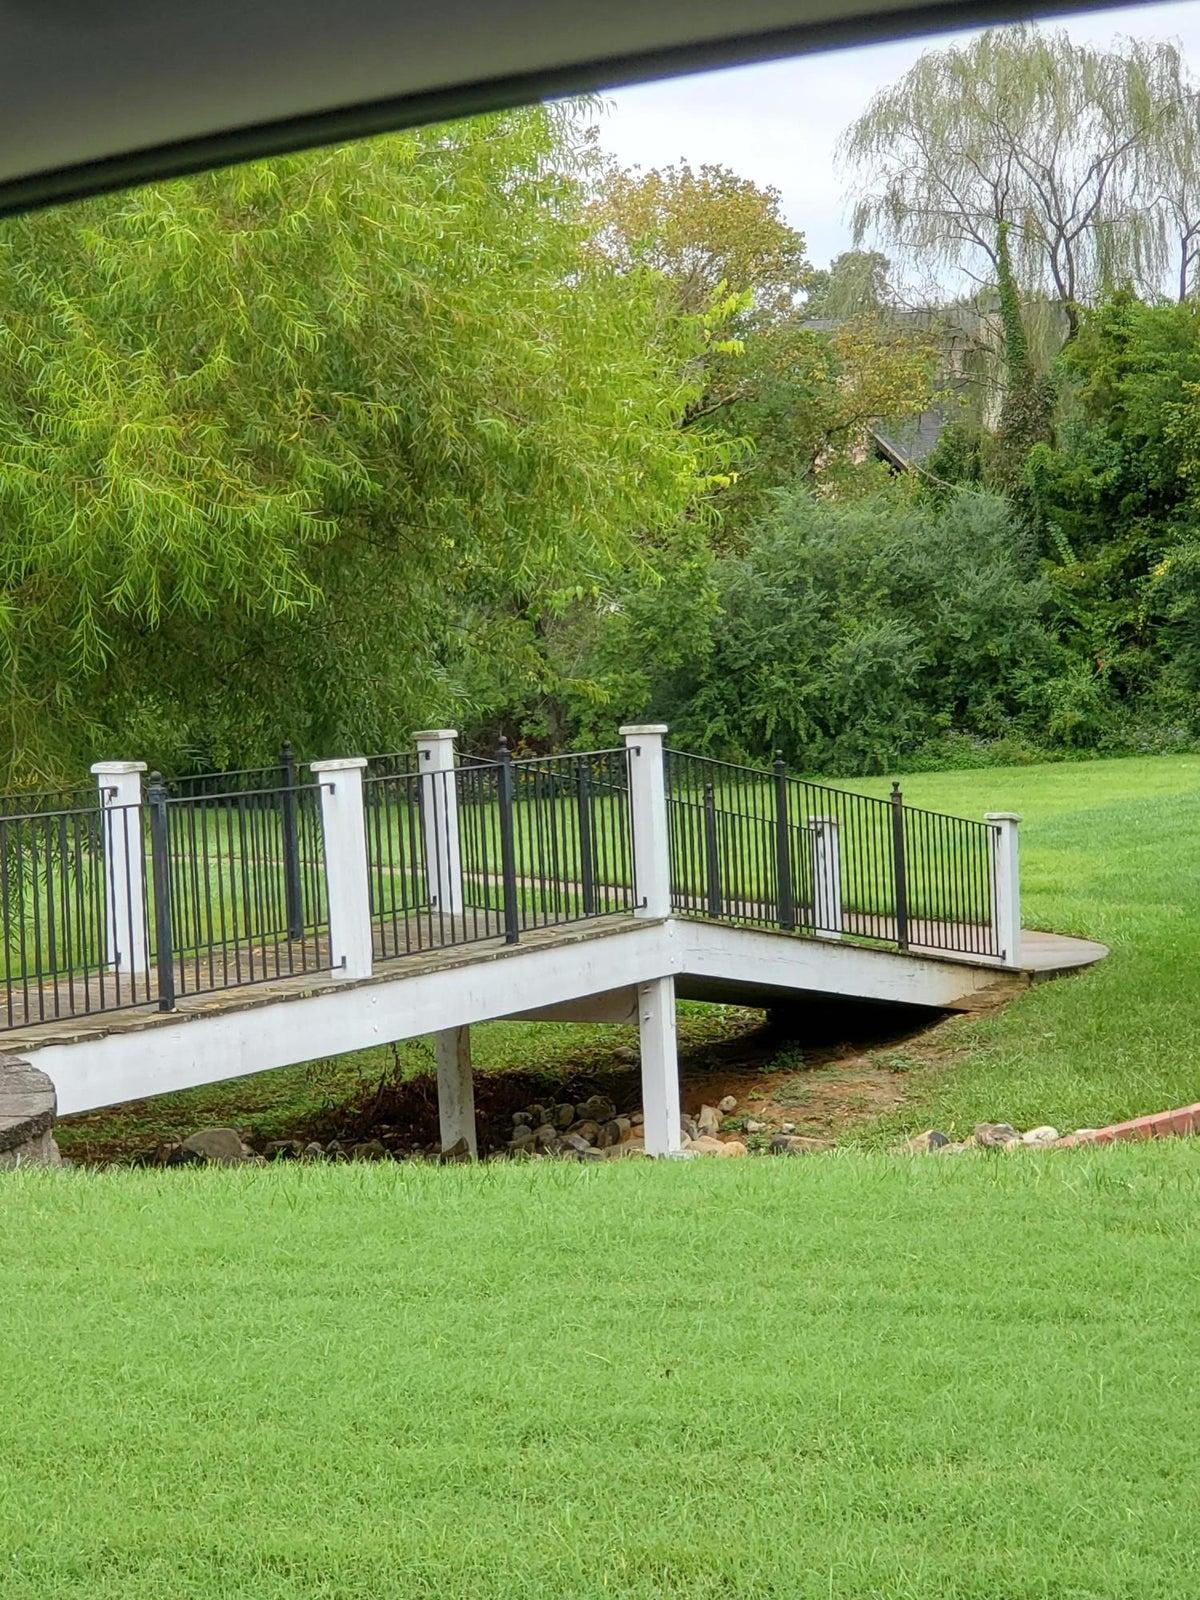 Bridge to Common Area nd lake